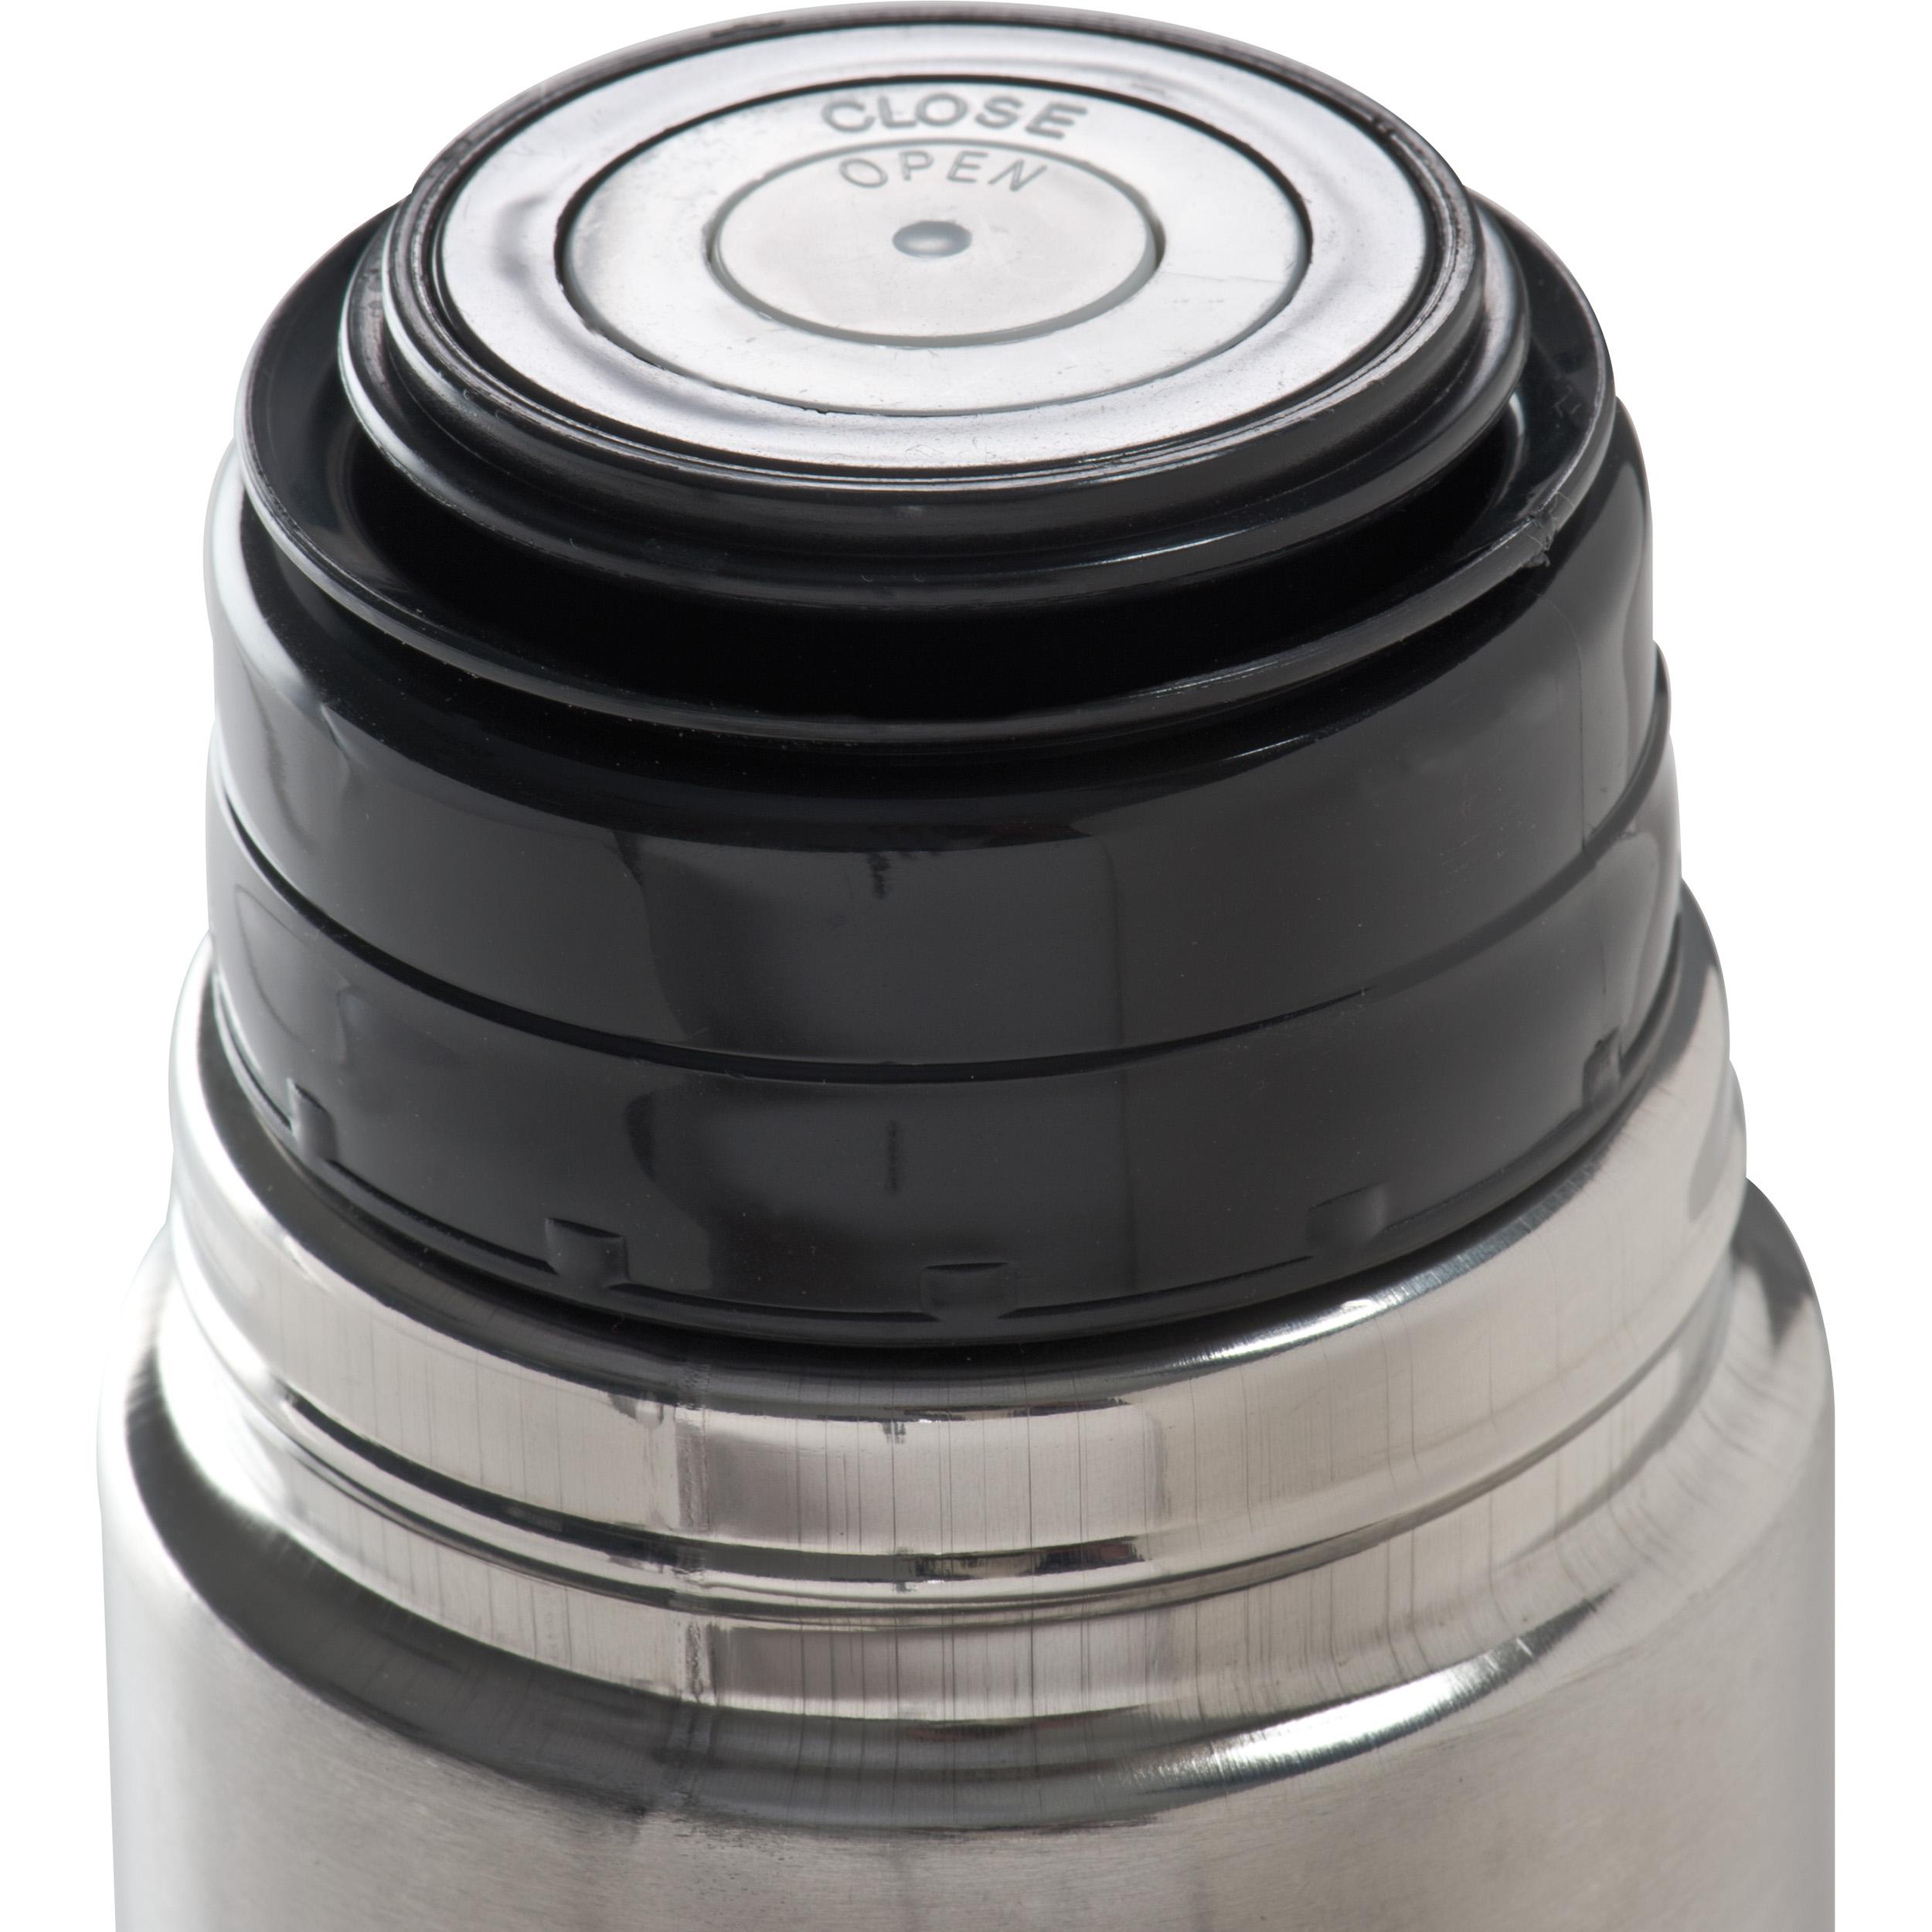 Doppelwandige Vakuum-Isolierkanne aus Edelstahl, 1000 ml